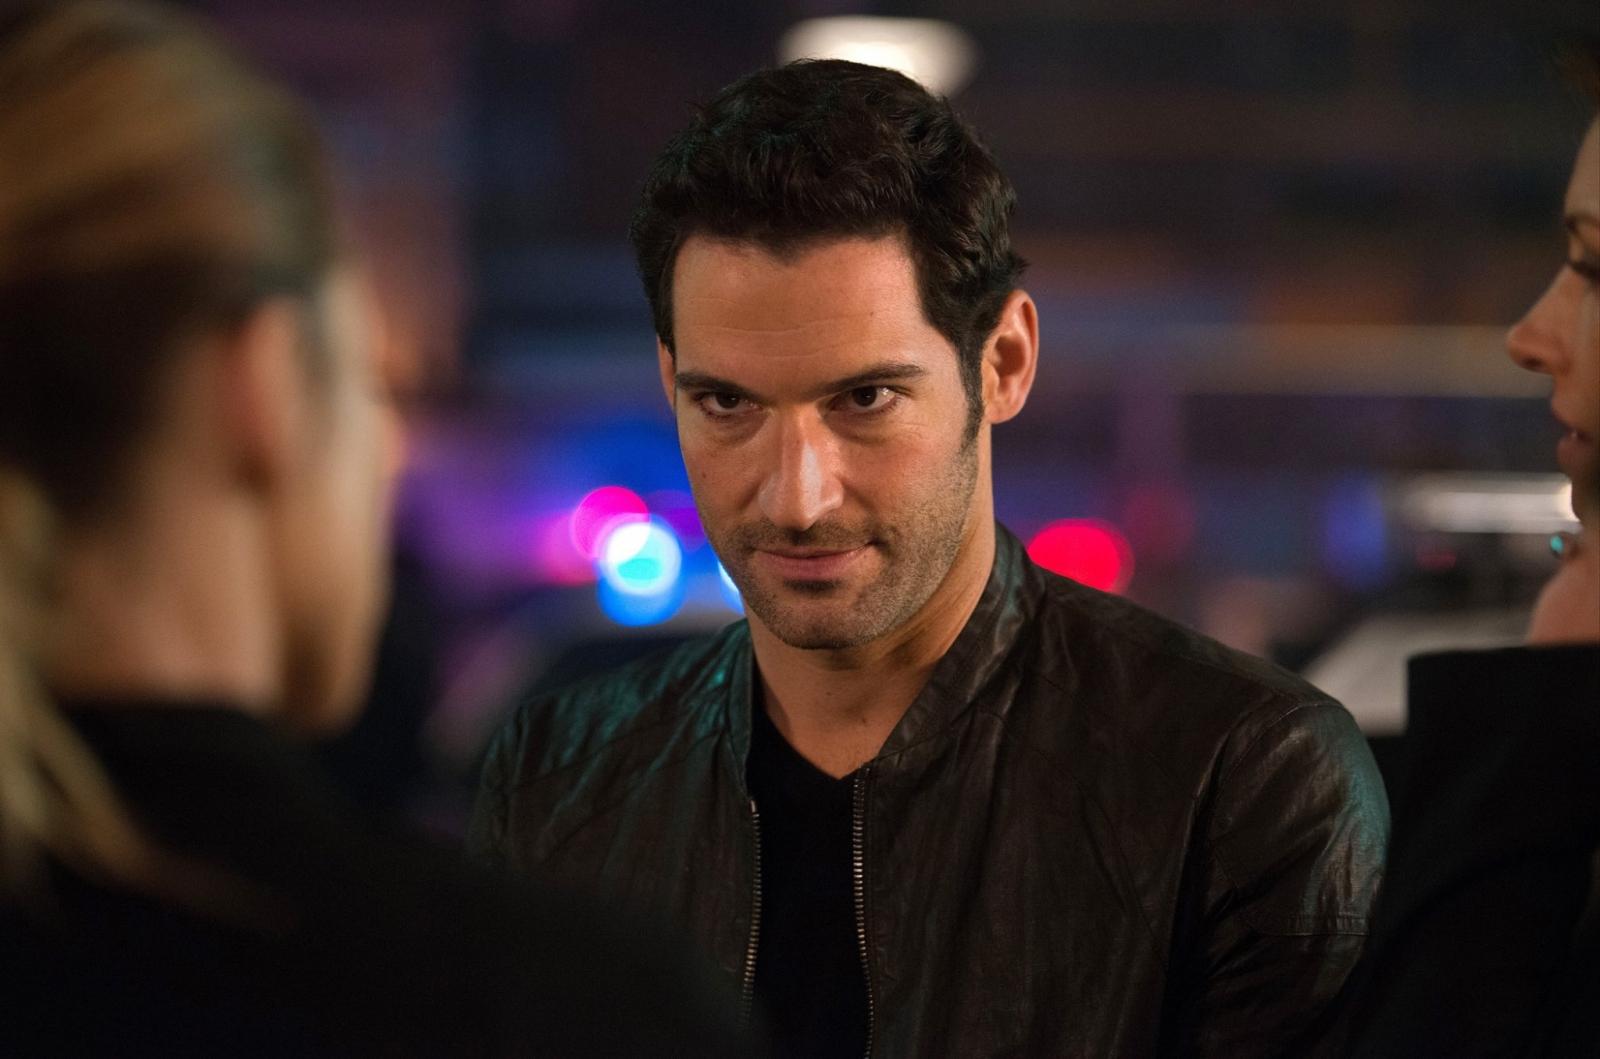 'Lucifer' Season 5 episode 15 teases an upcoming celebration